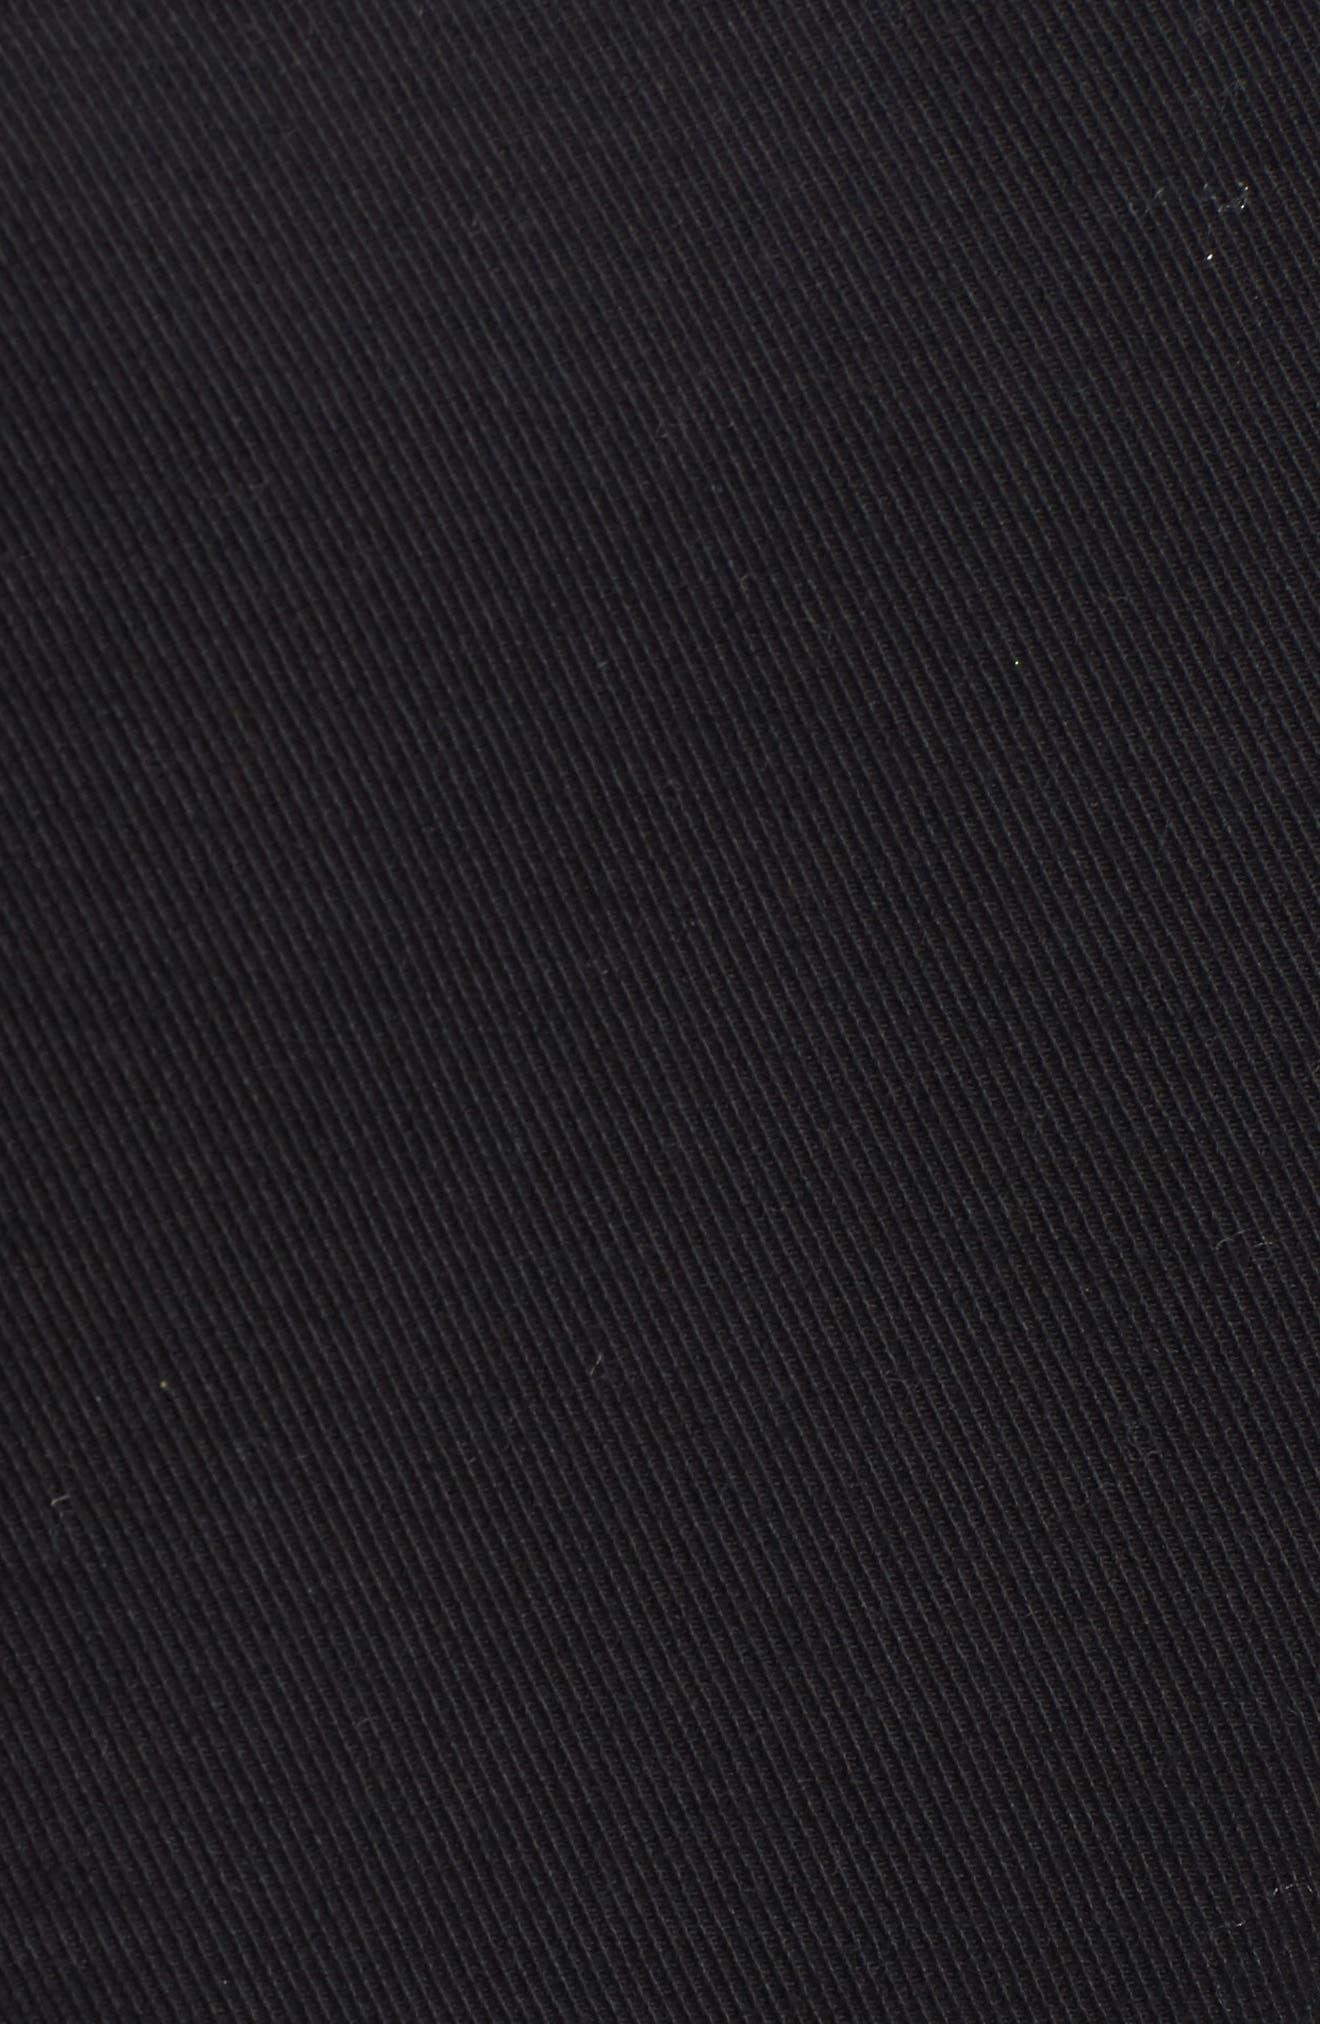 Shay Cargo Pants,                             Alternate thumbnail 5, color,                             001